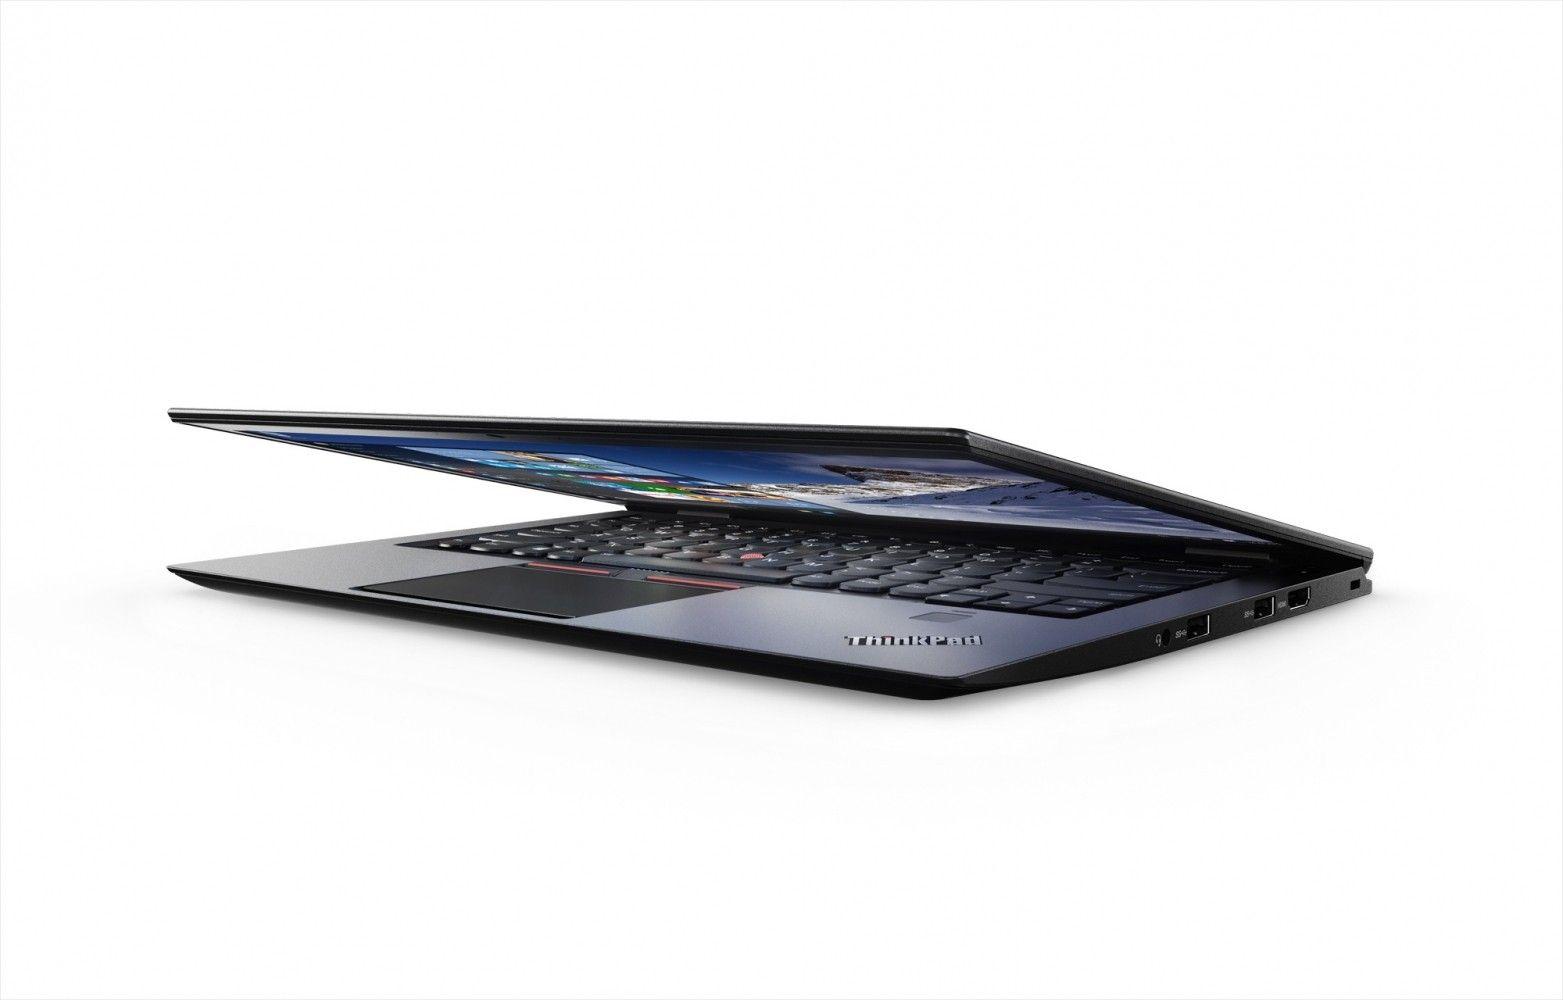 Ноутбук LENOVO ThinkPad X1 Carbon G4 (20FBS02H00) - 4